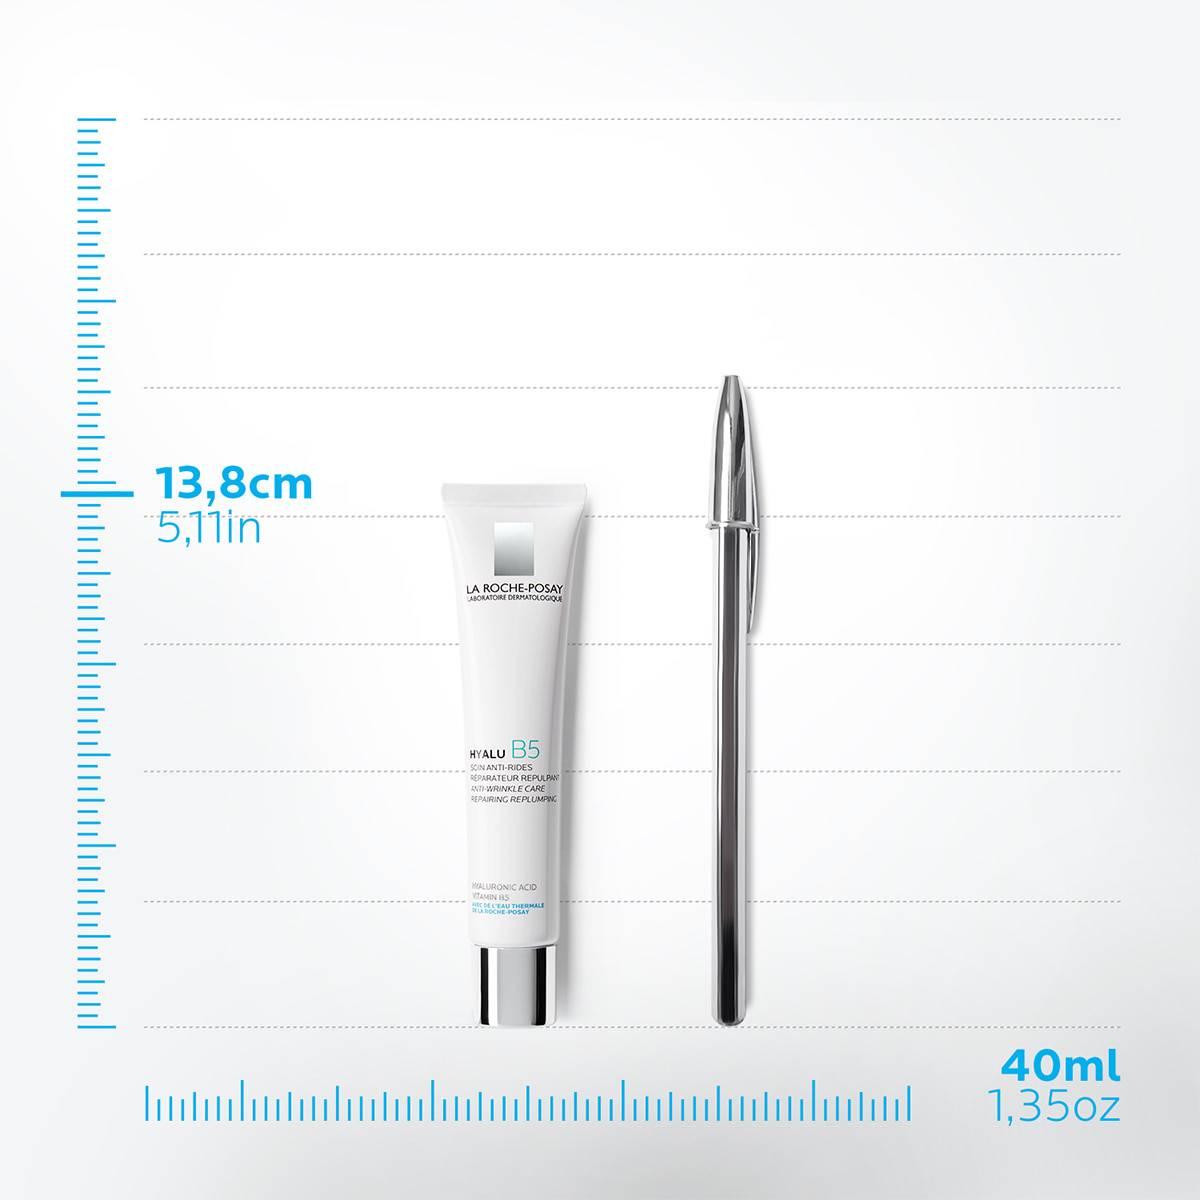 La Roche Posay ProductPage Anti Aging Hyalu B5 Care 40ml 3337875583589